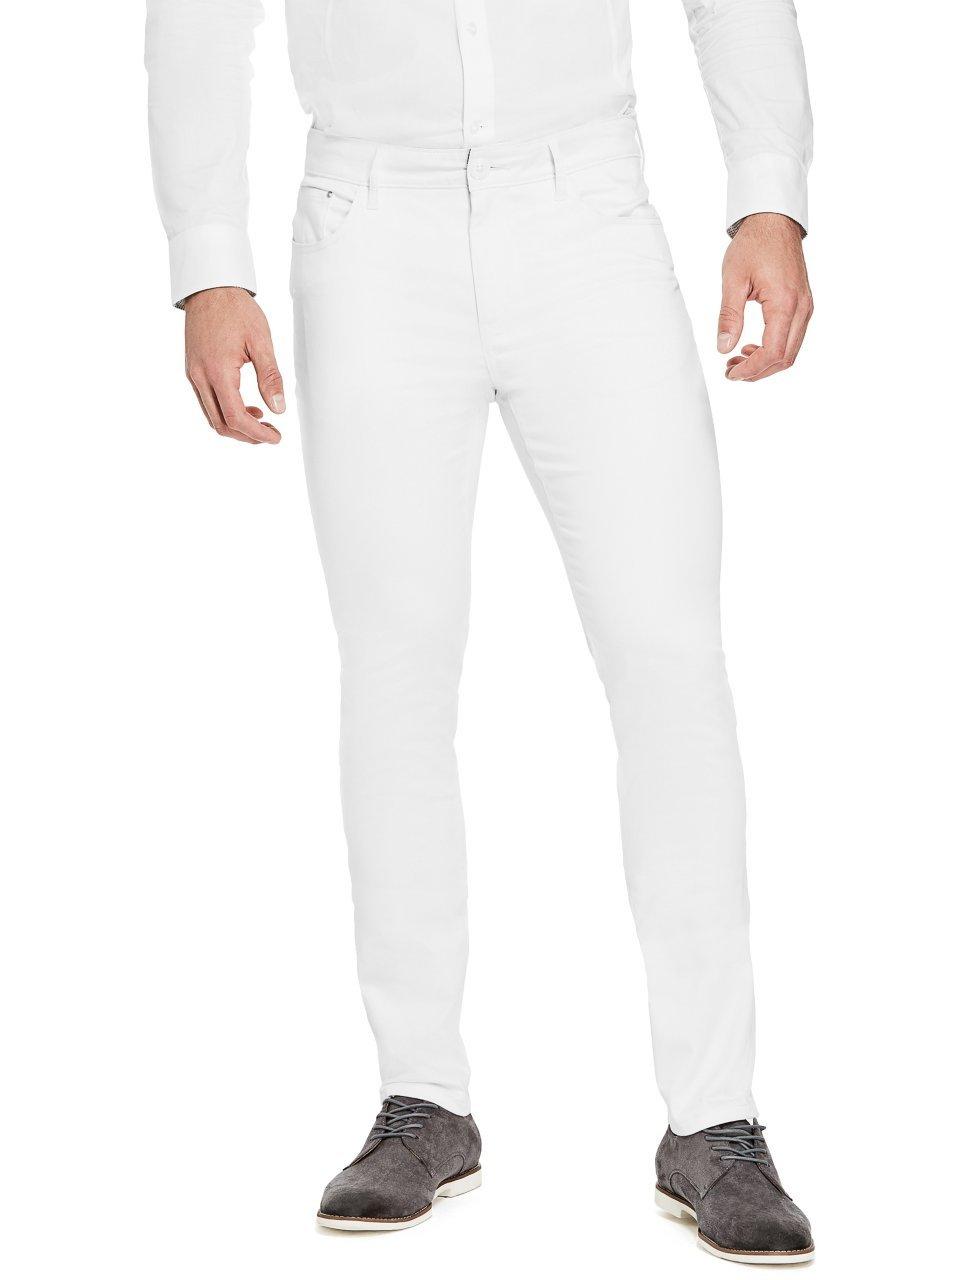 G by GUESS PANTS メンズ B07CM68DW2 36 / R|ホワイト(True White) ホワイト(True White) 36 / R